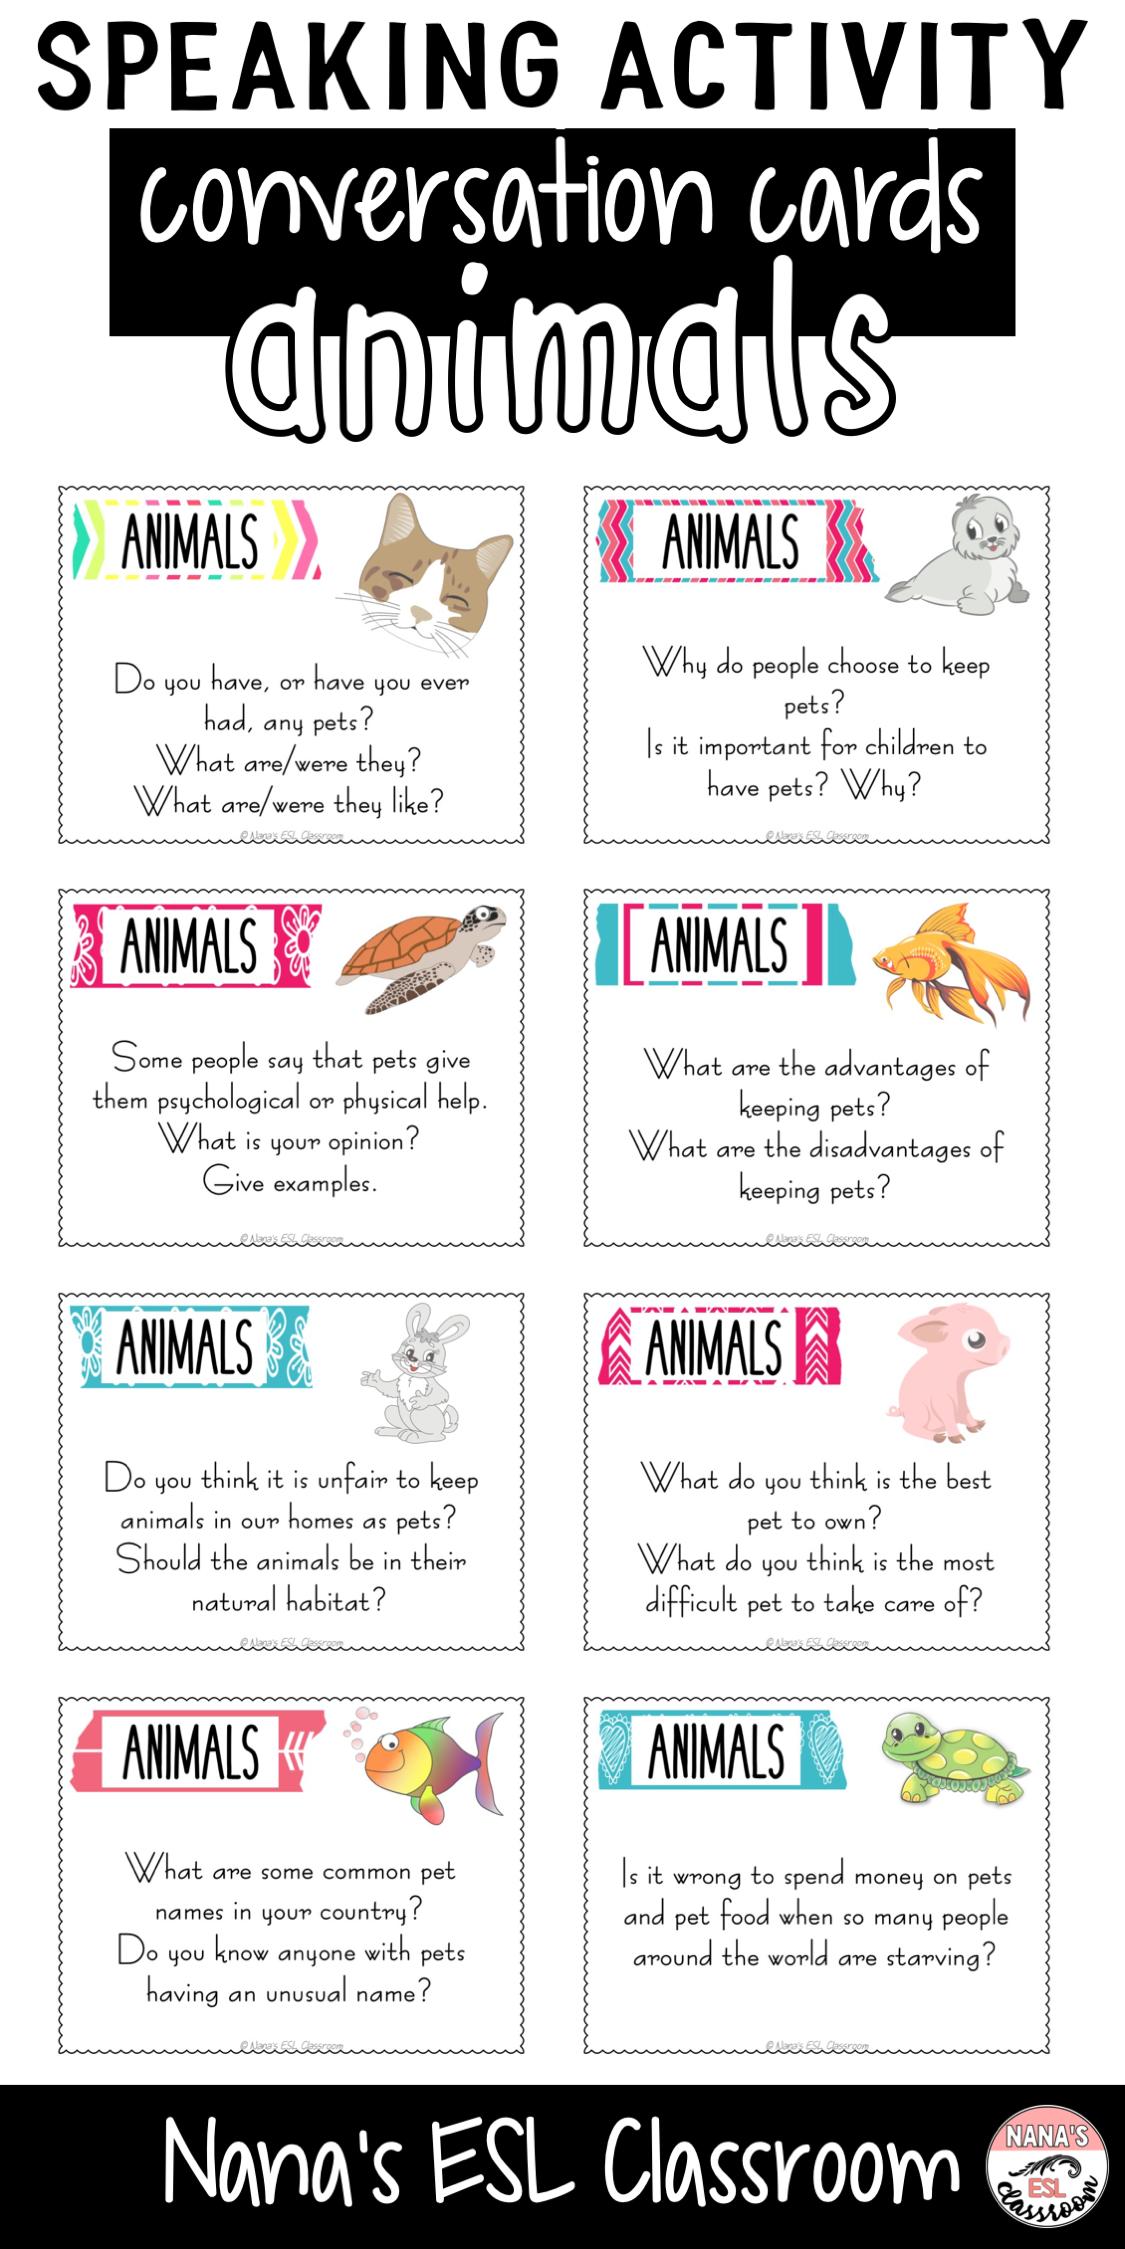 Conversation Starters About Animals